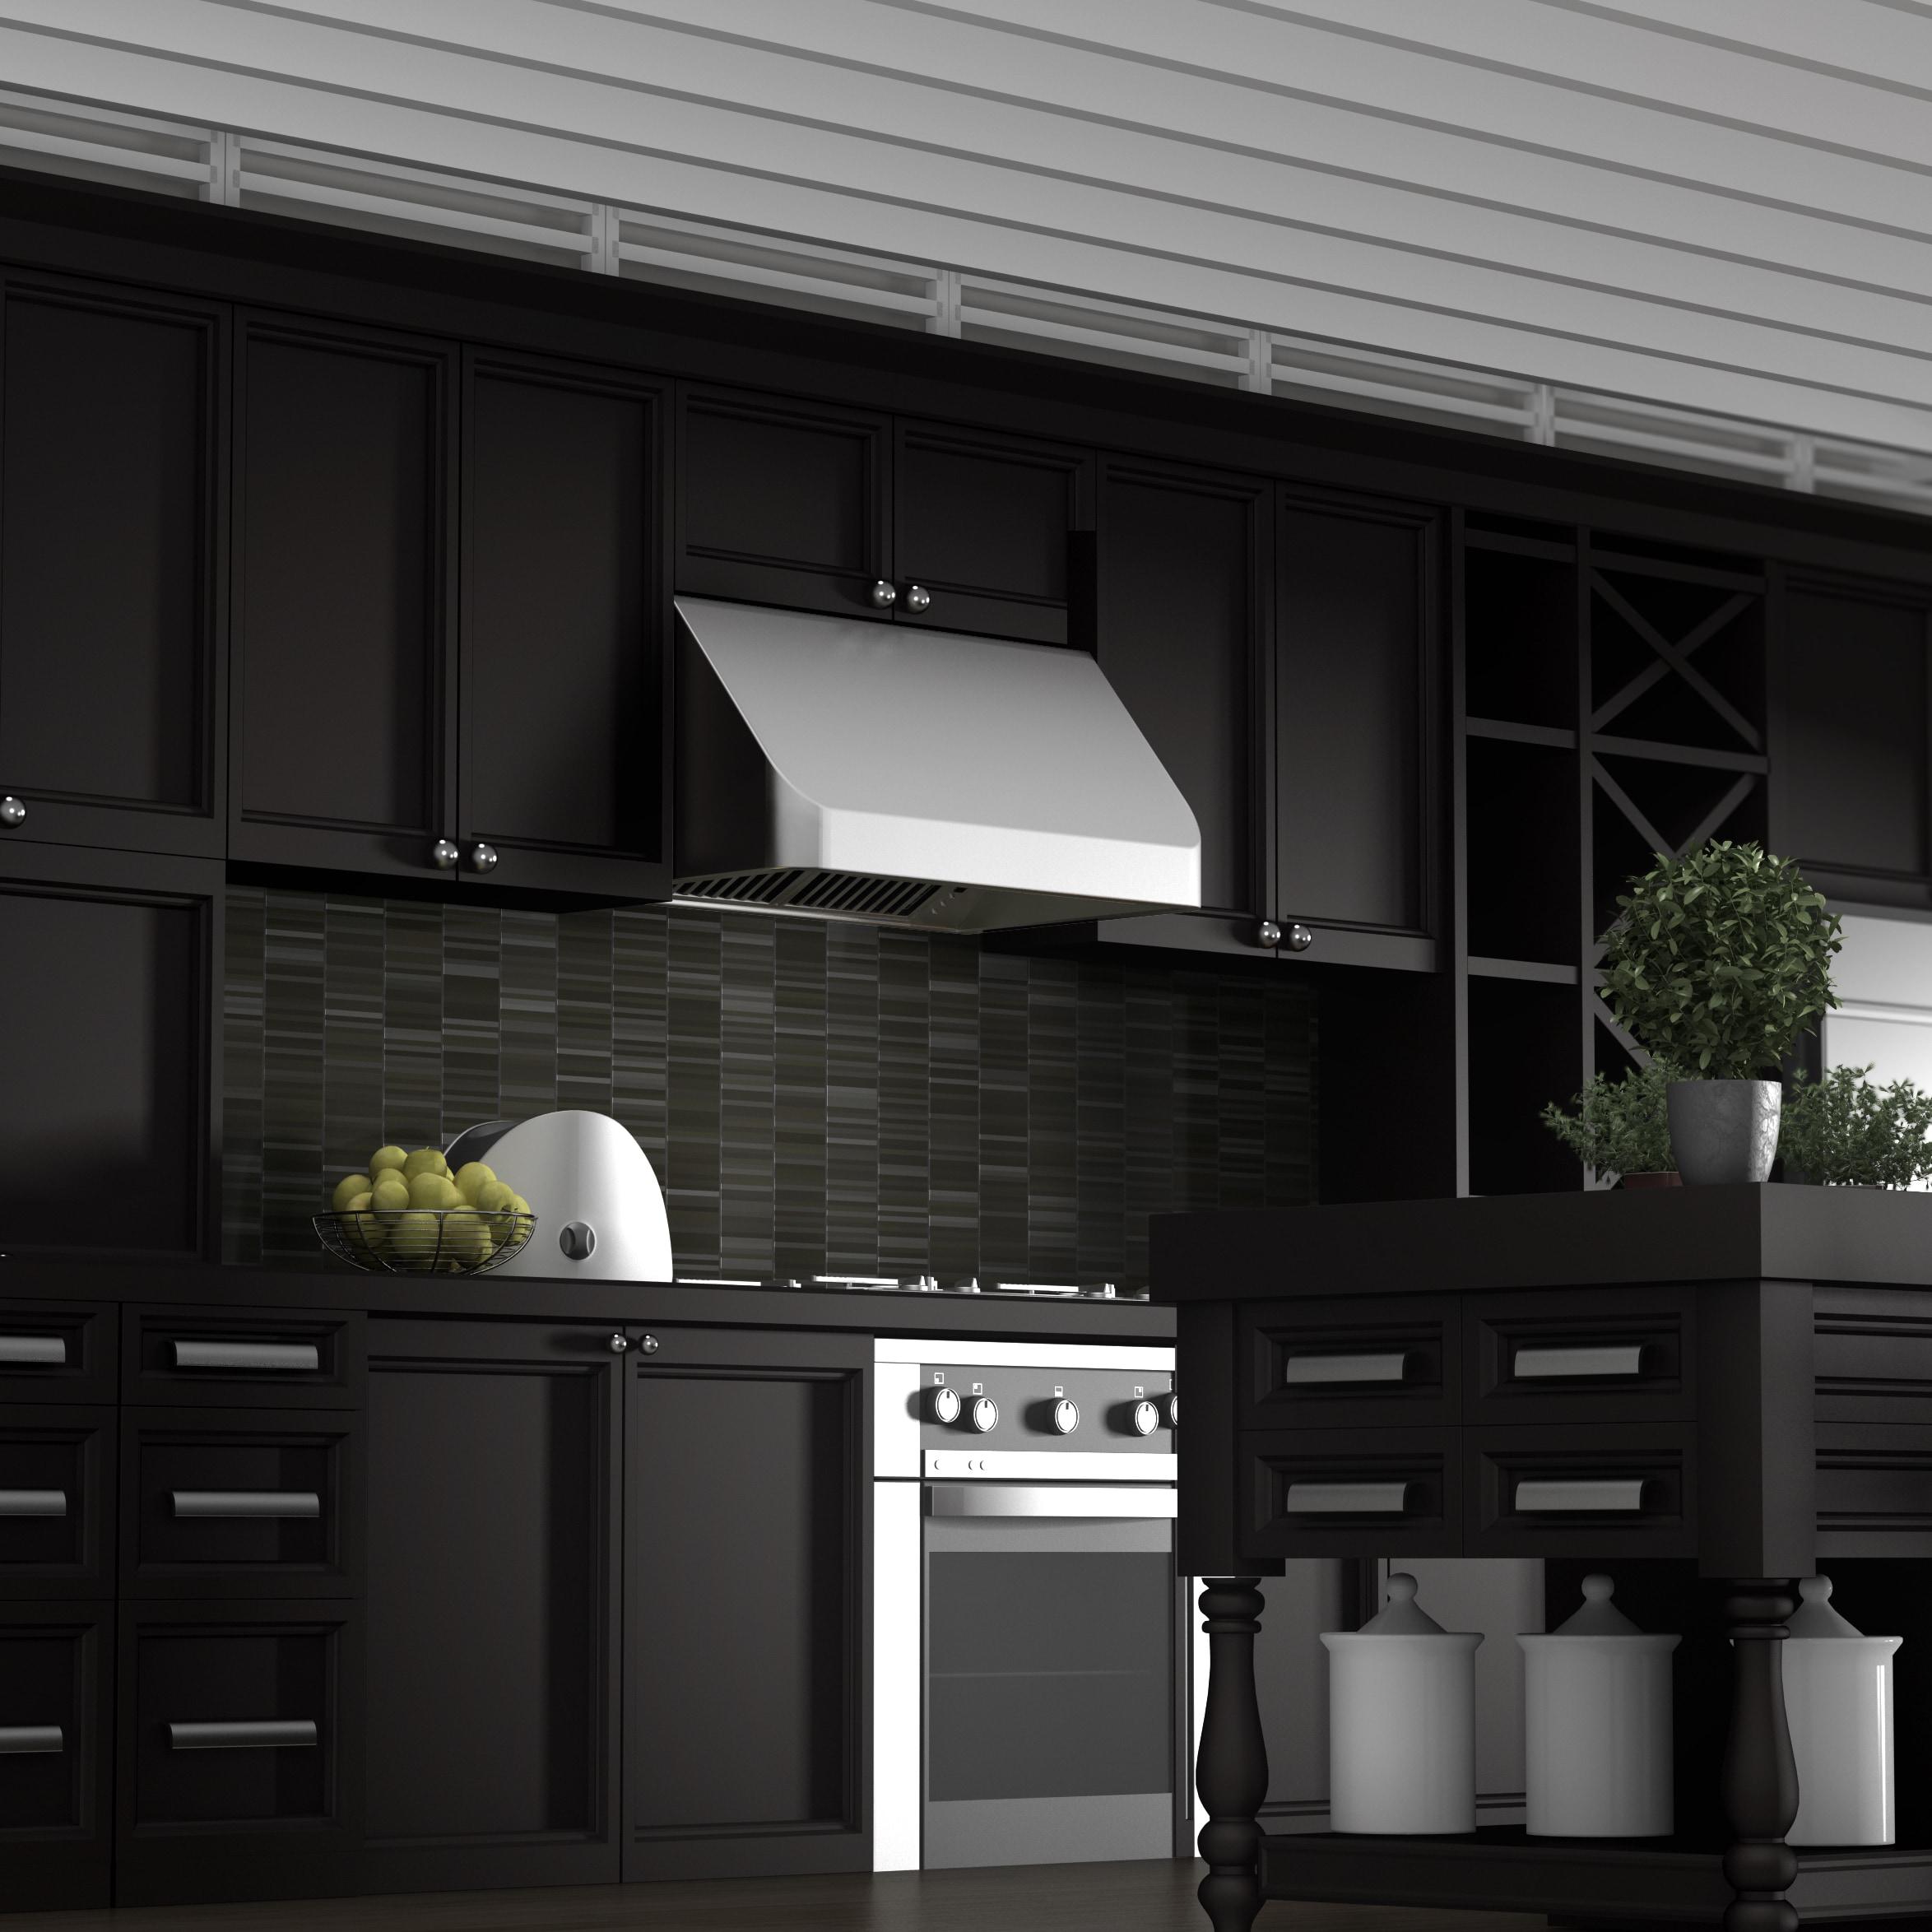 Unique 36 Stainless Steel Range Hood Under Cabinet